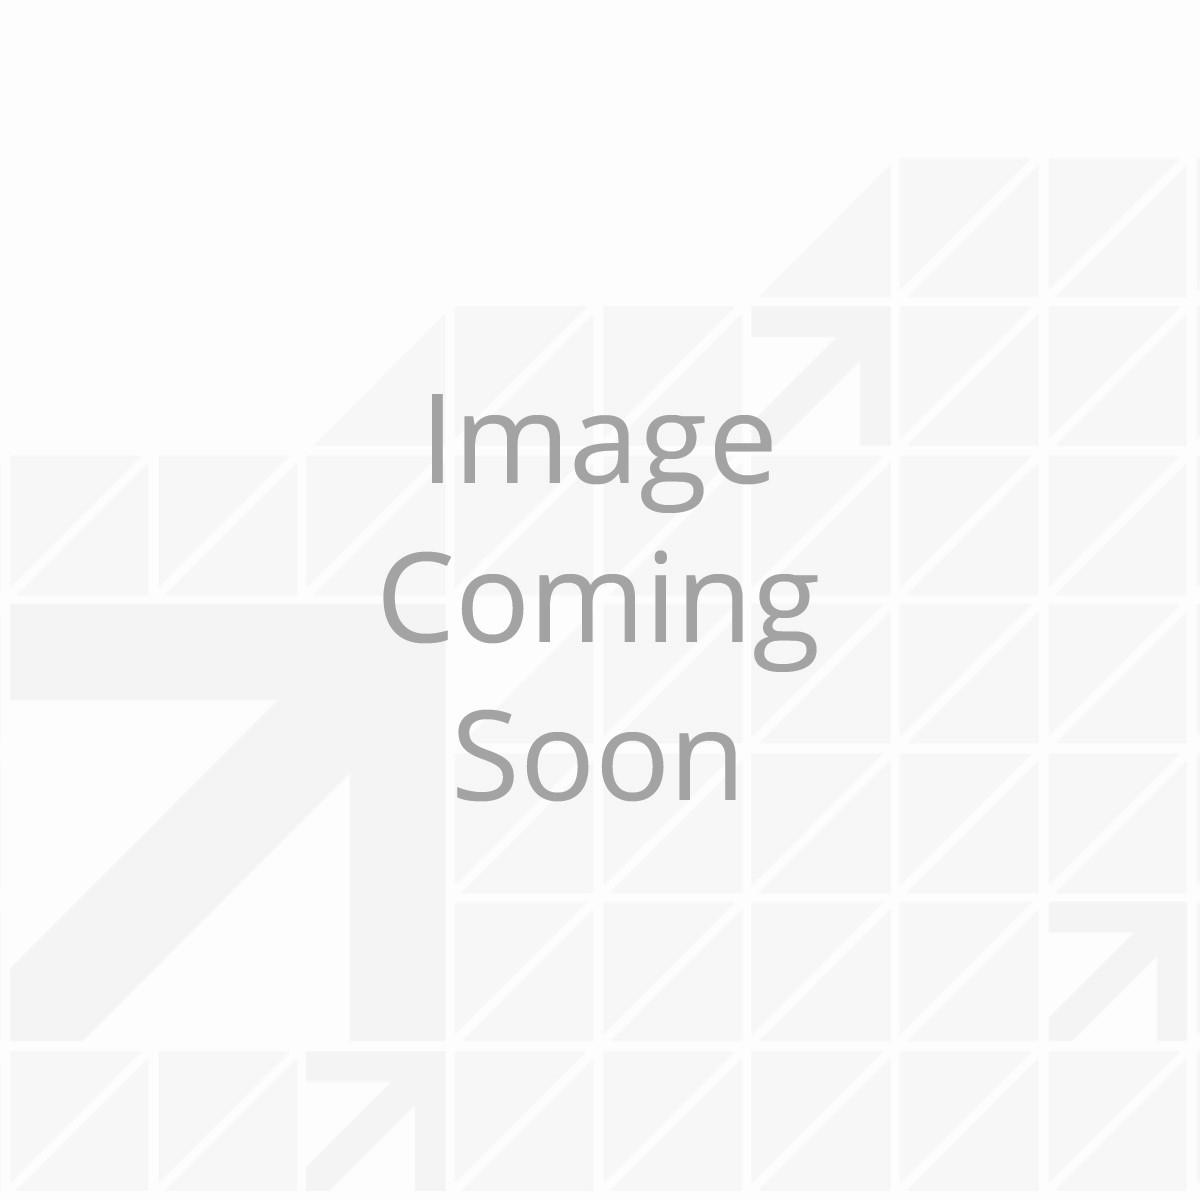 Over-Bed Bent Plate Gooseneck Hitch (Carbide Black Powder Coat, No Ball)